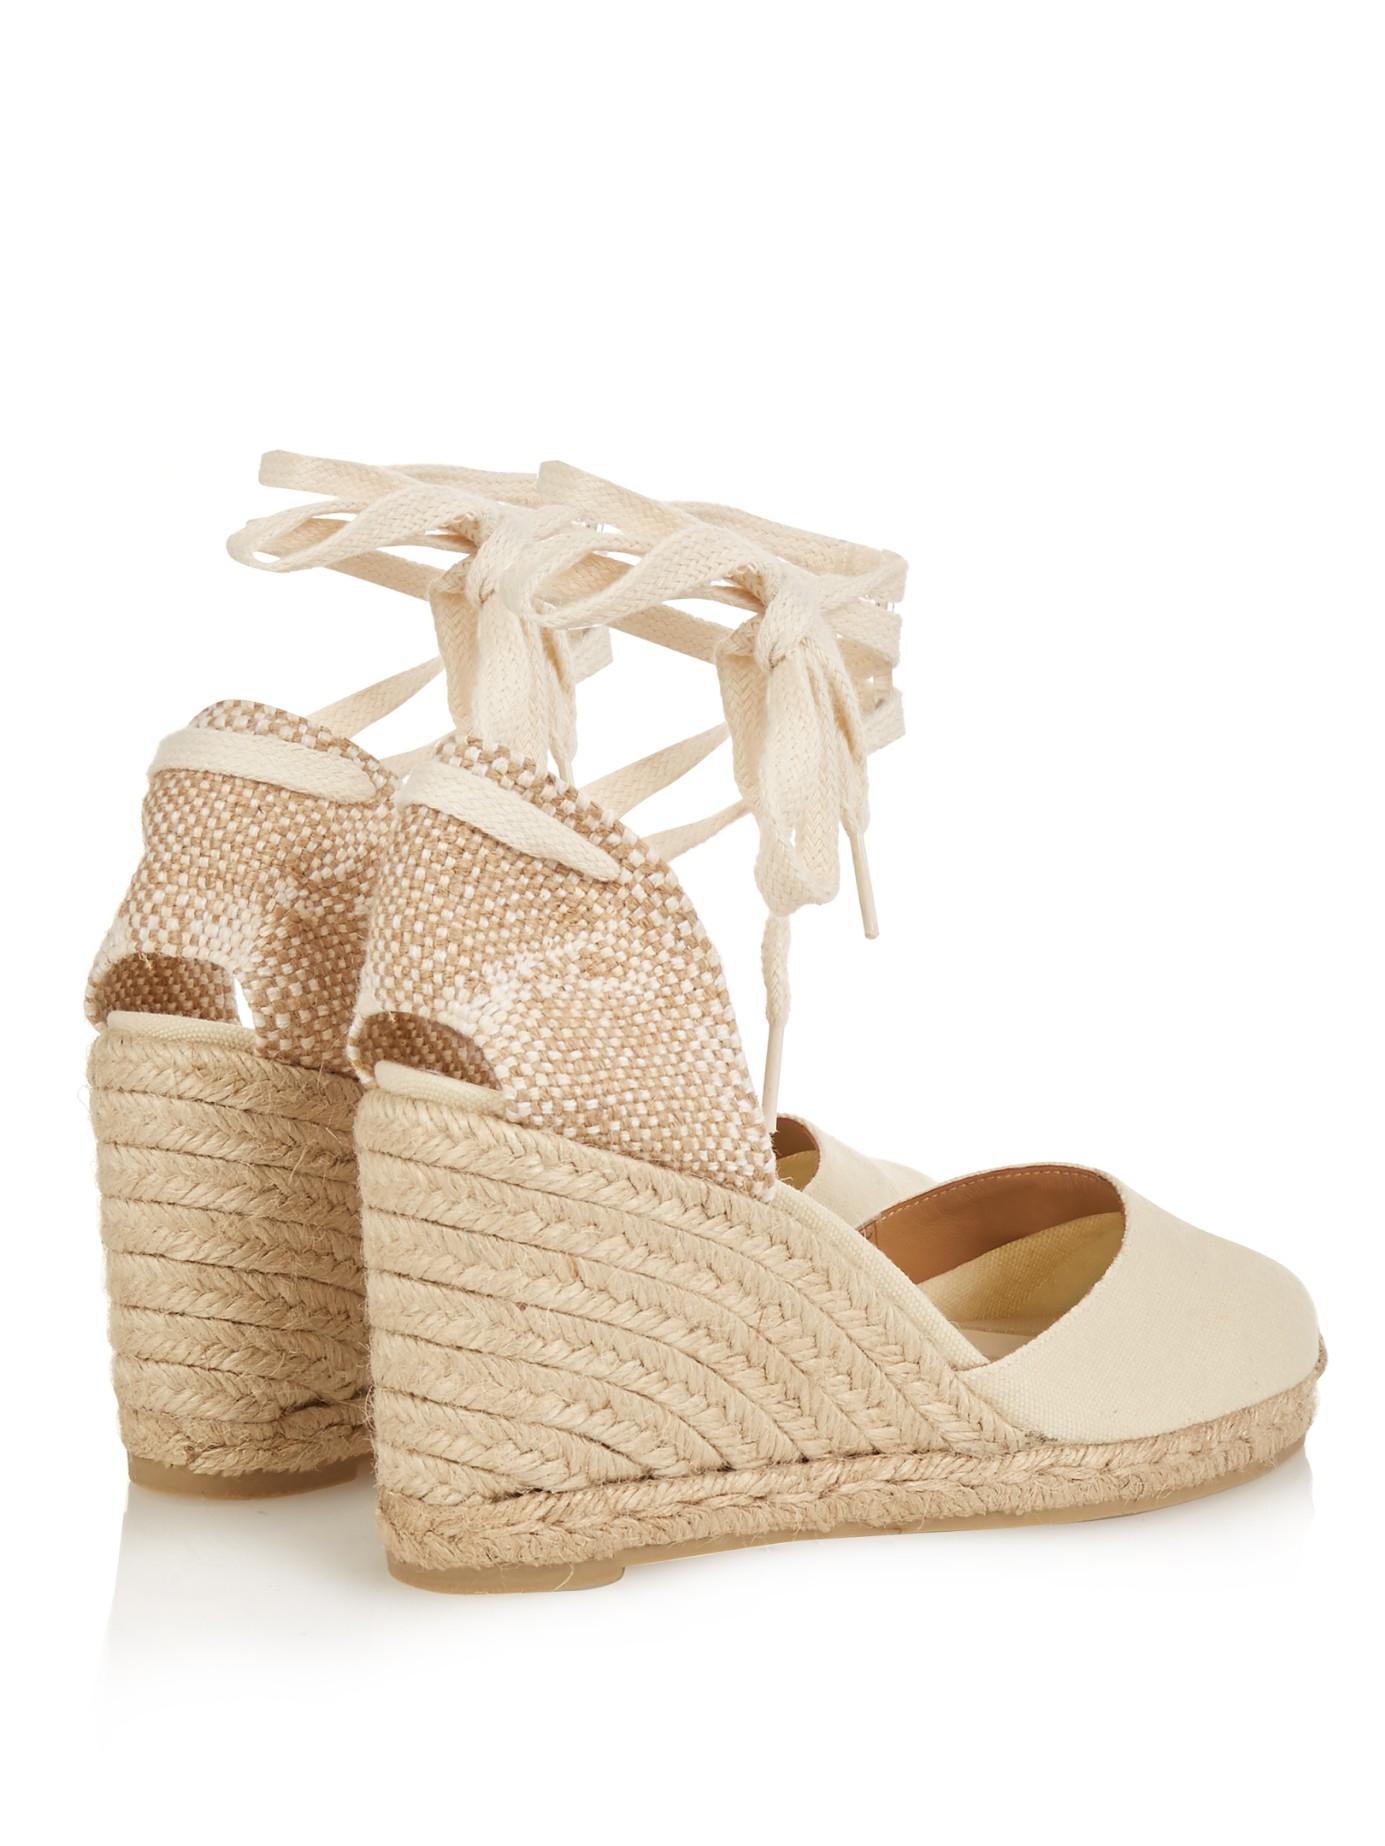 Castaner Women's Carina Lace Up Espadrille Wedge Sandals Wv92LFfxG